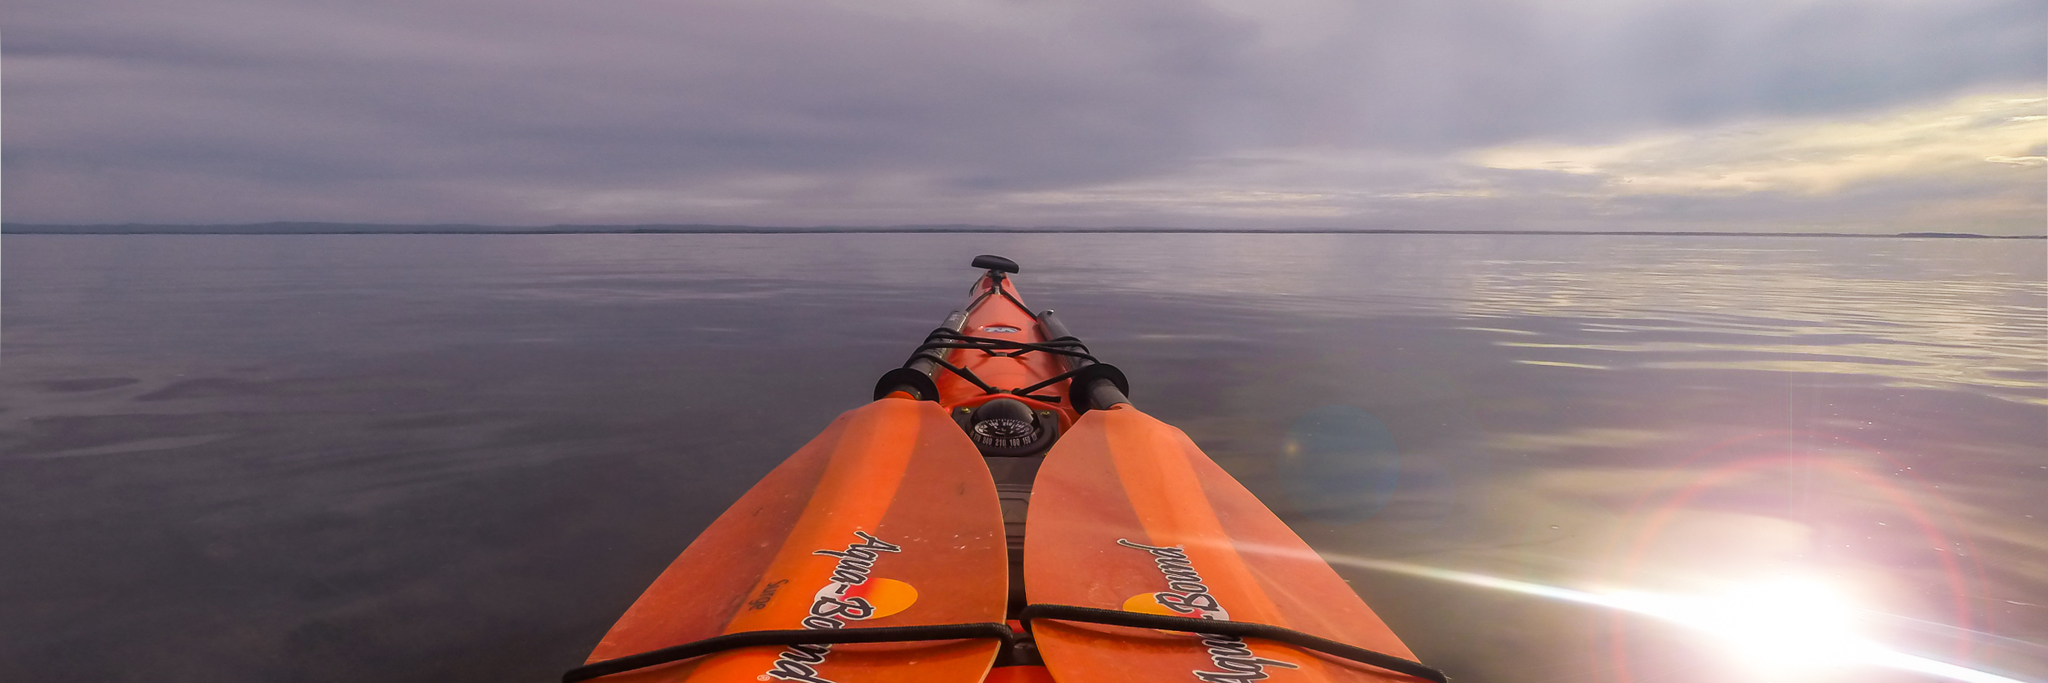 chip_macalpine_erie_canal_kayaking_8355